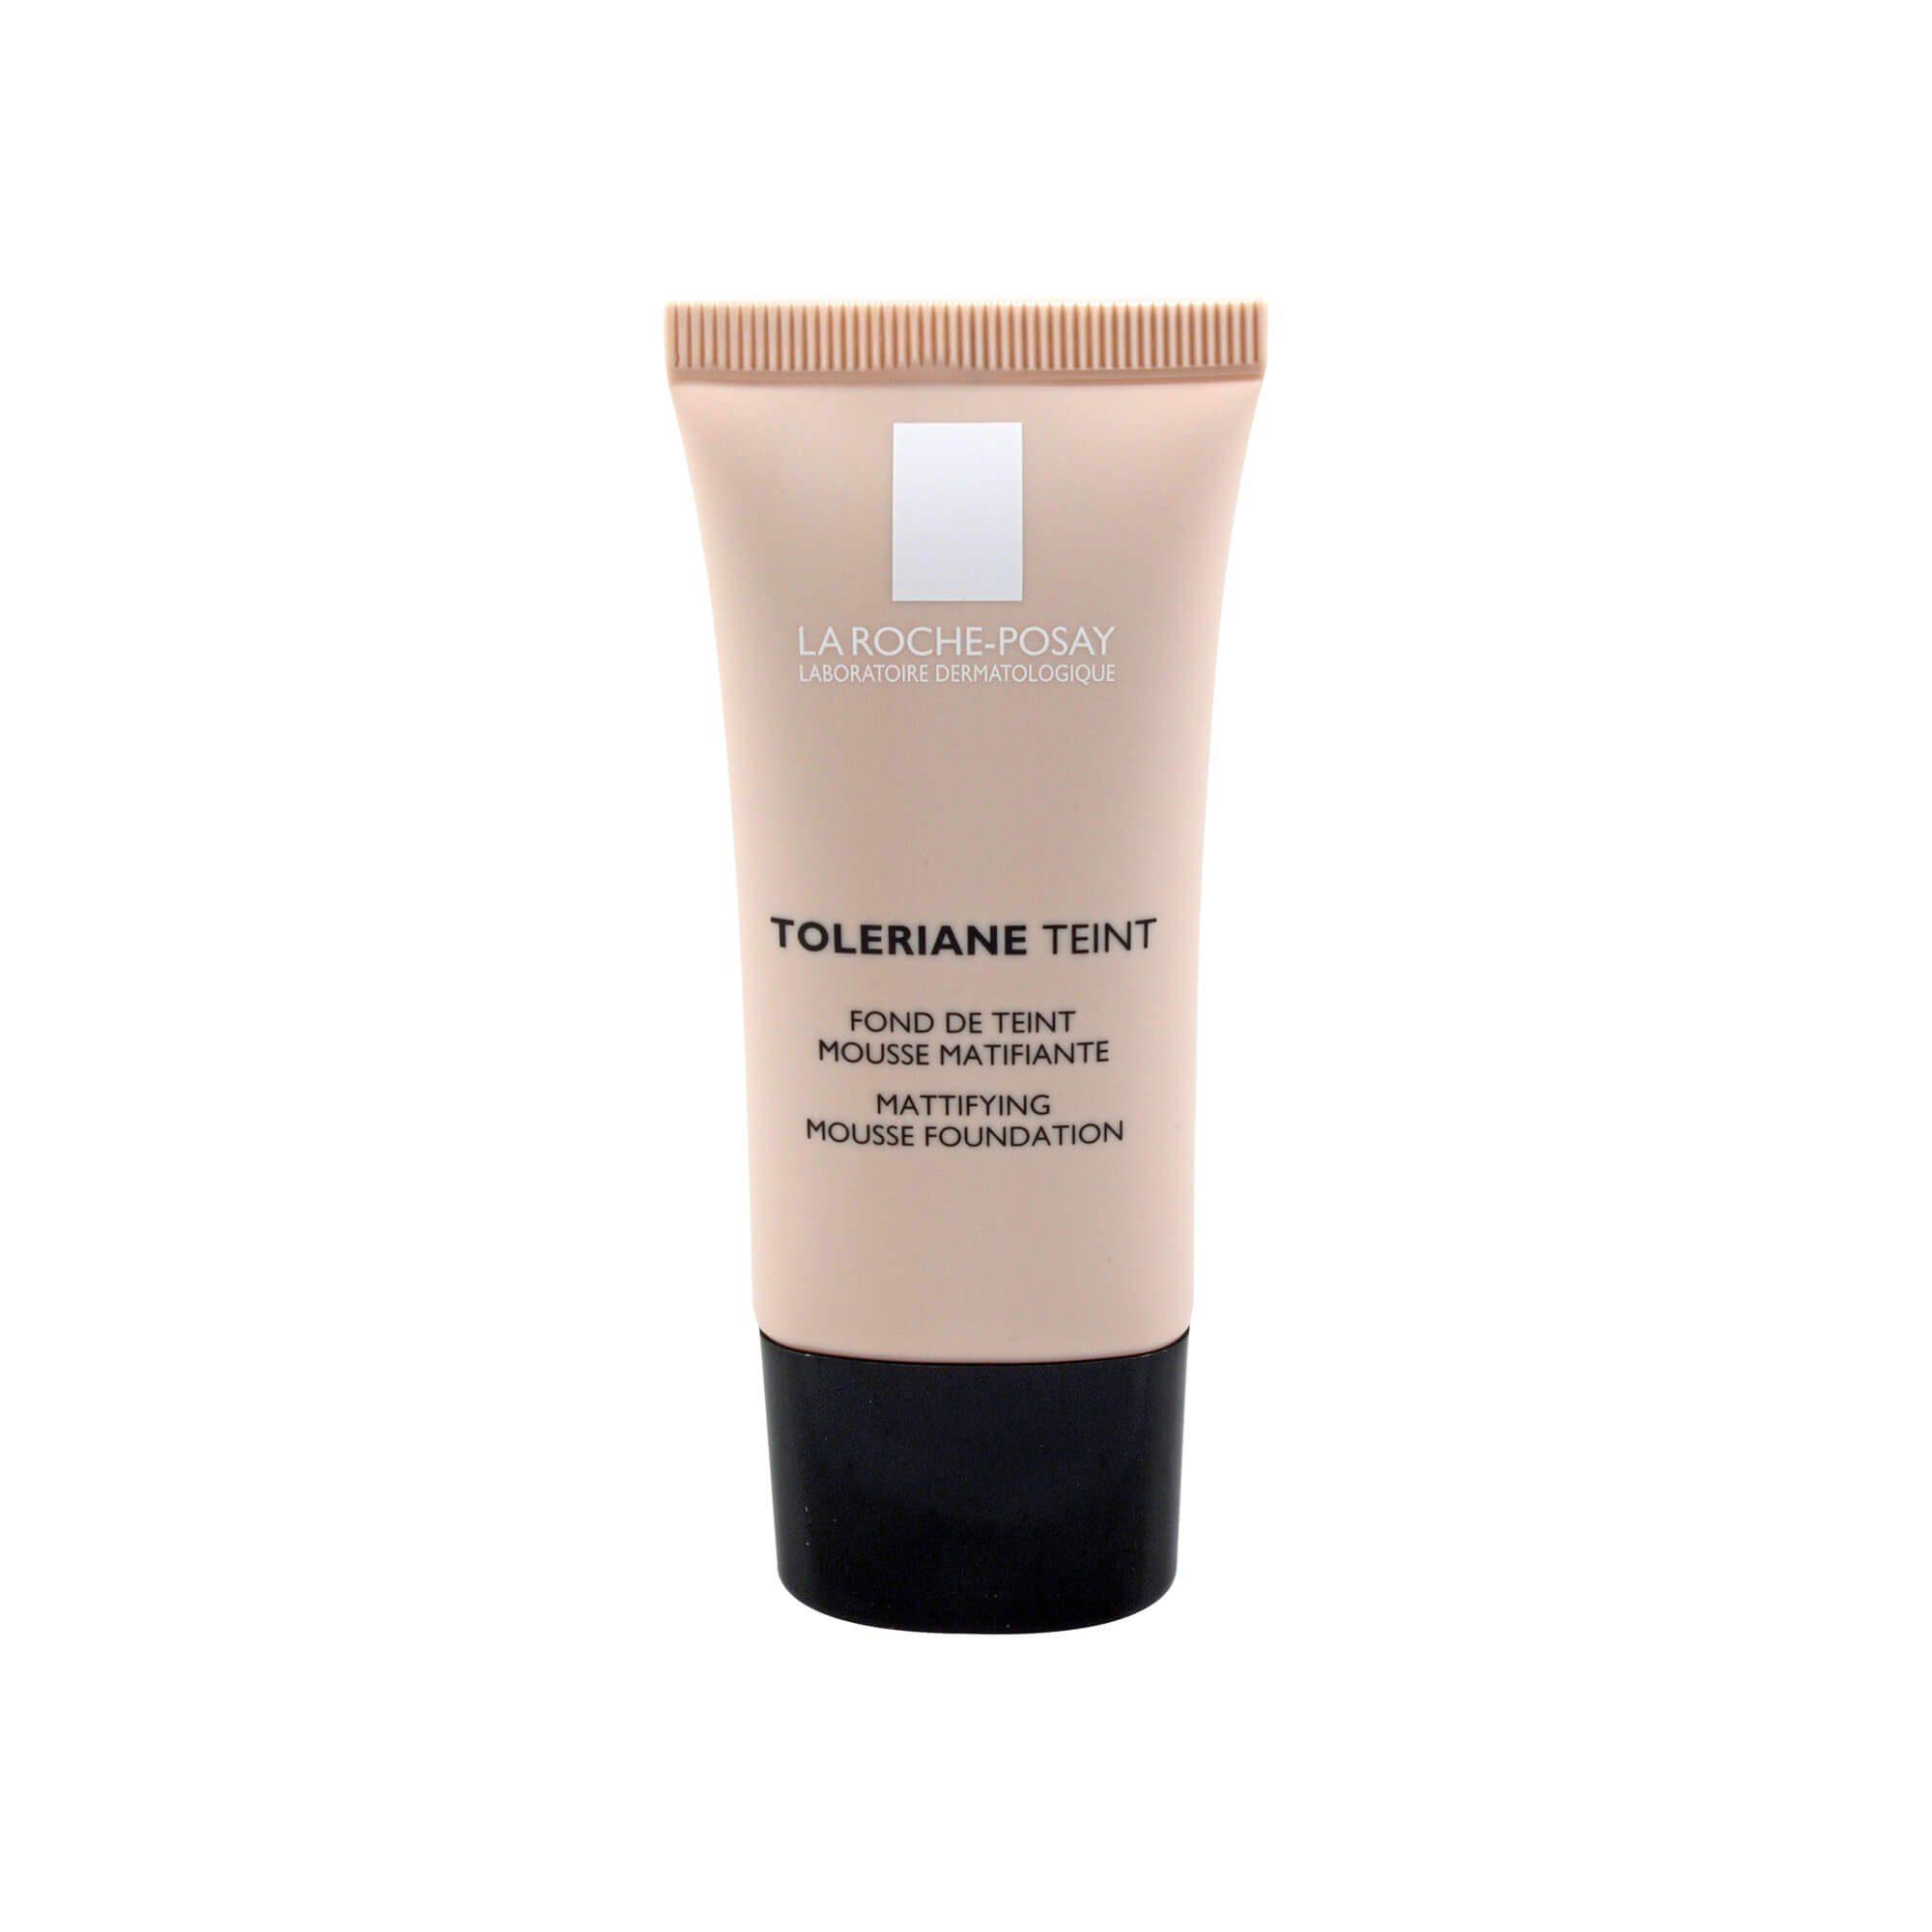 La Roche-Posay Roche Posay Toleriane Teint Mousse Make-Up 01 , 30 ml